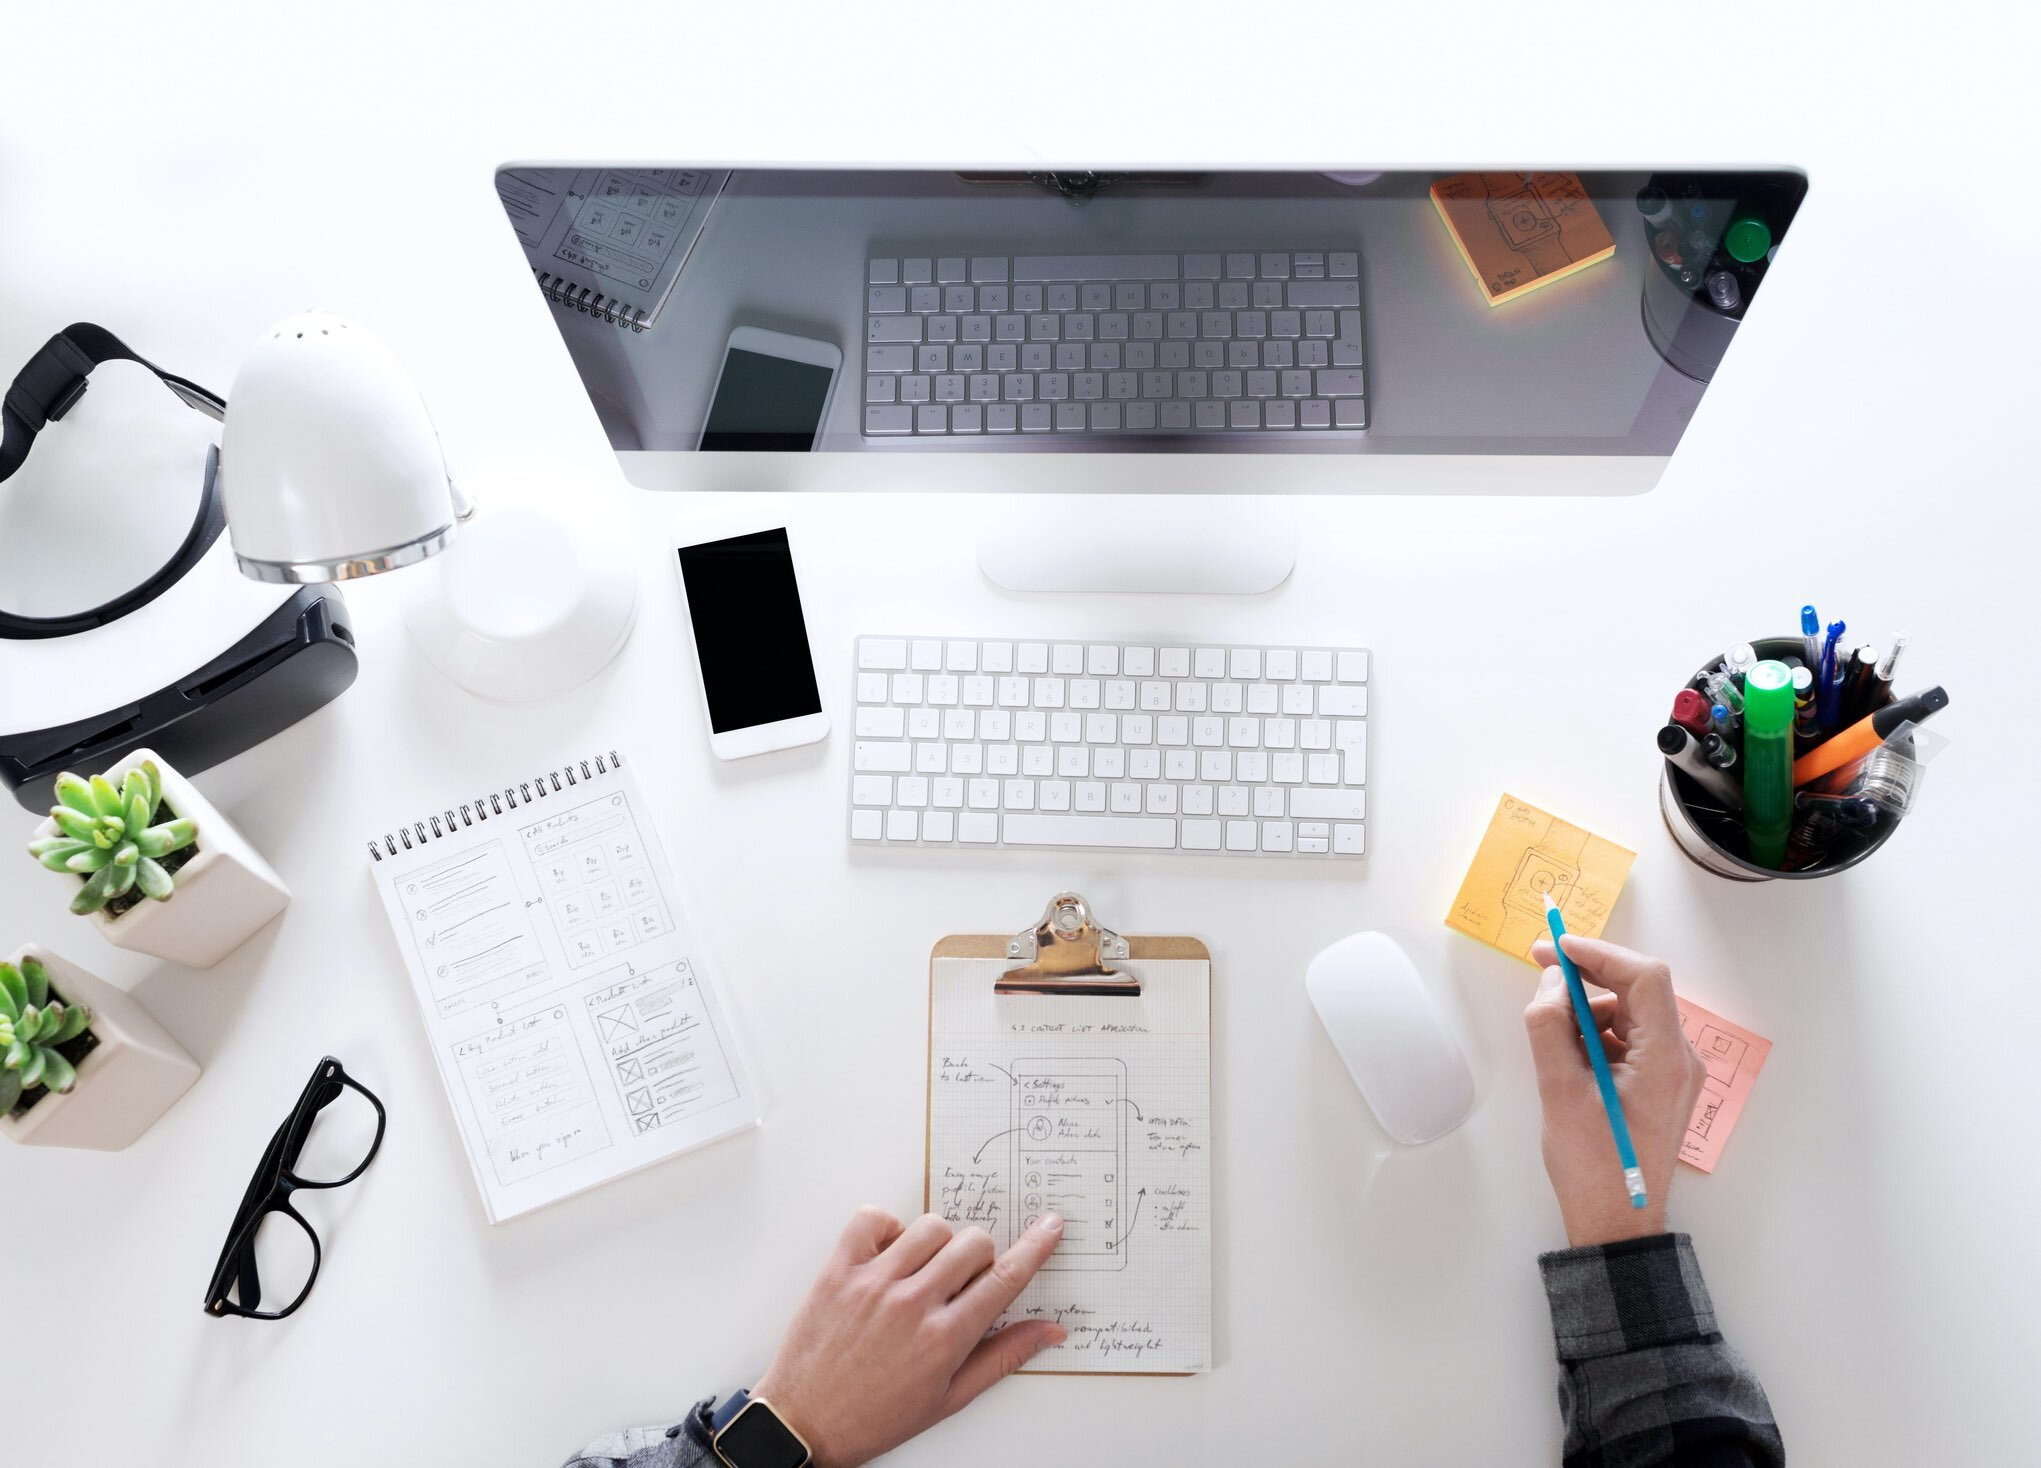 Justin Everett Consulting Web Designer Digital Marketer Vancouver Bc